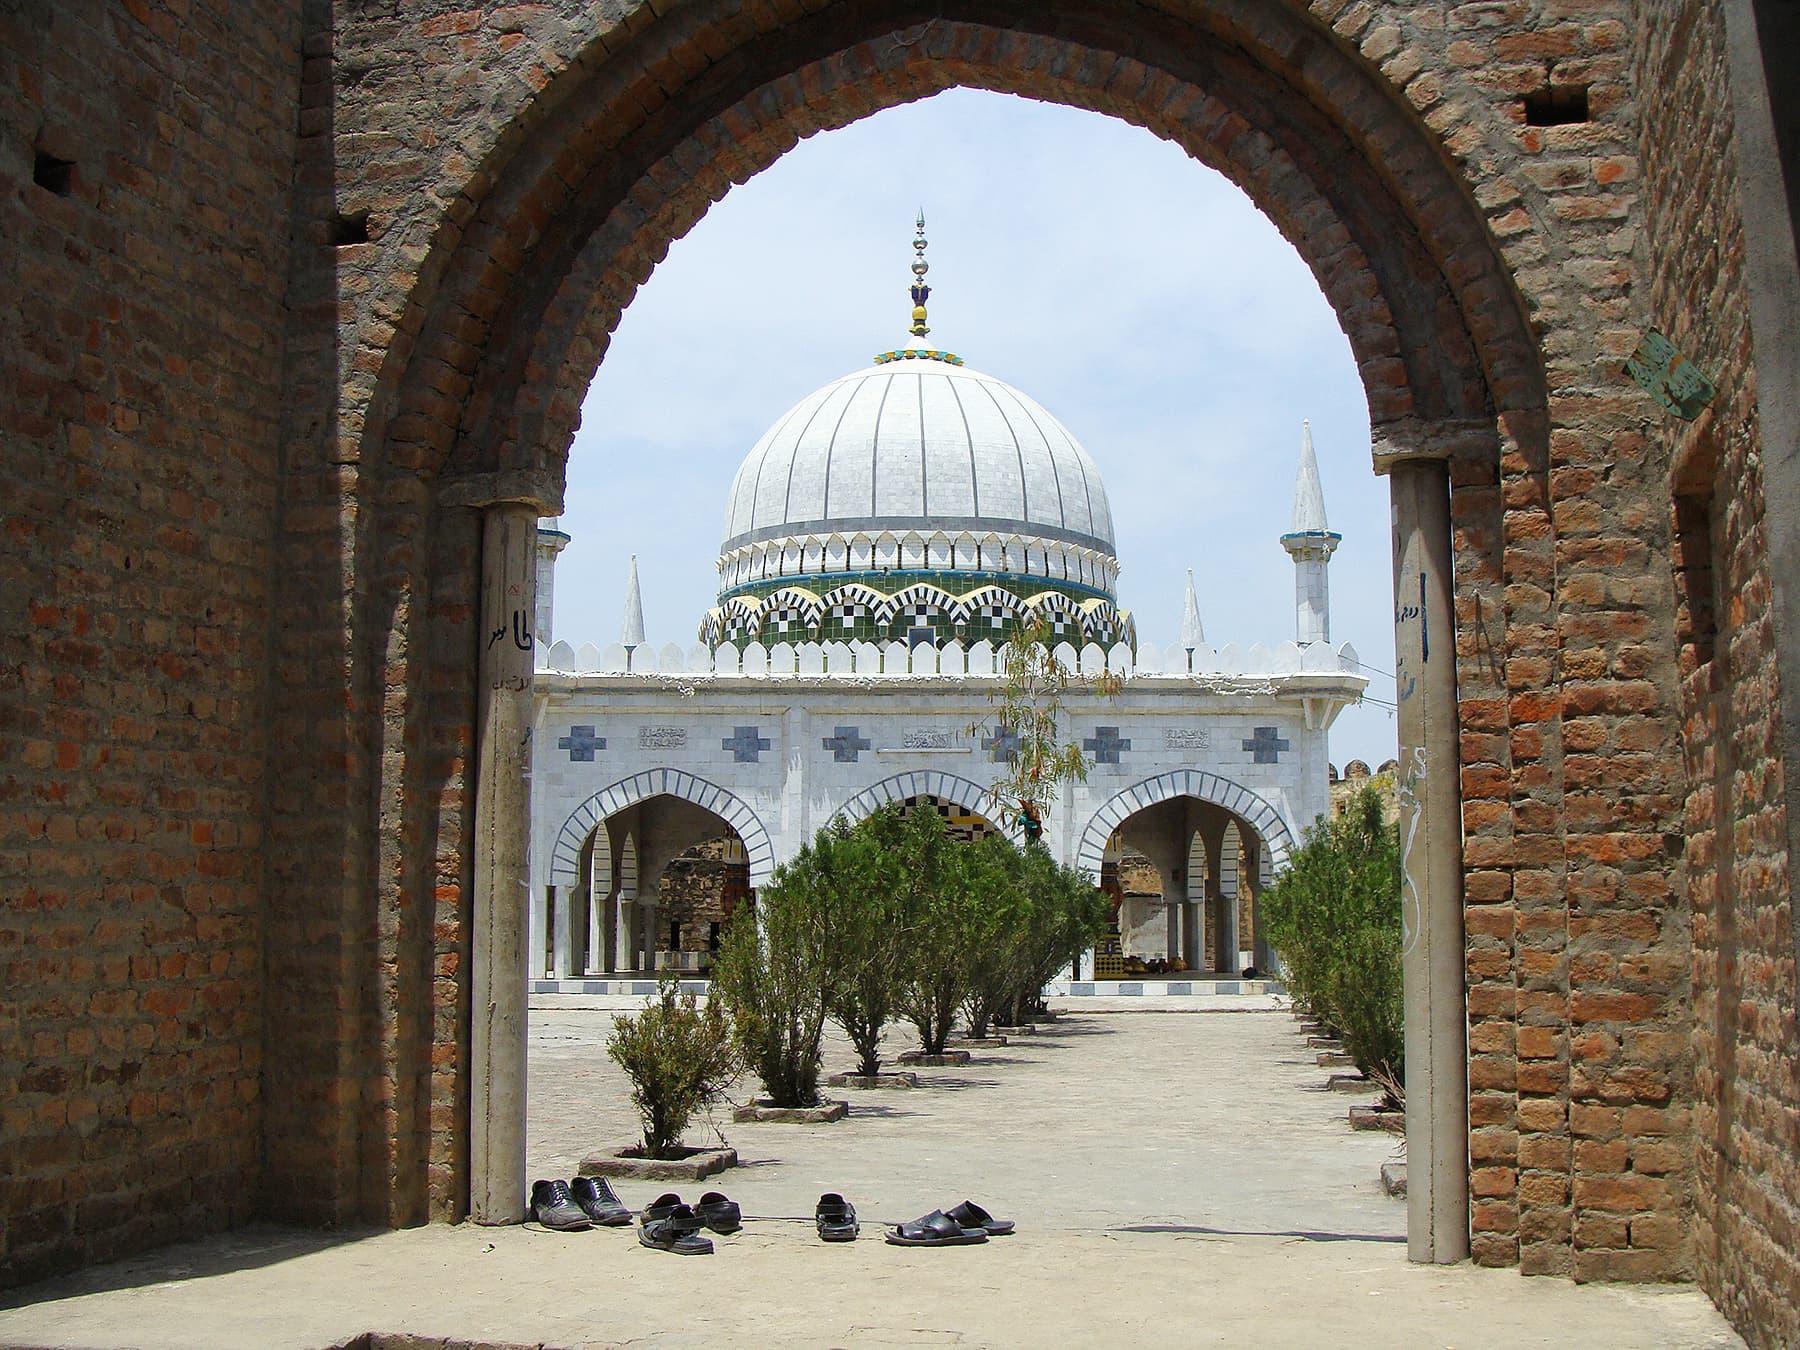 A view of Abdul Hakeem's shrine.